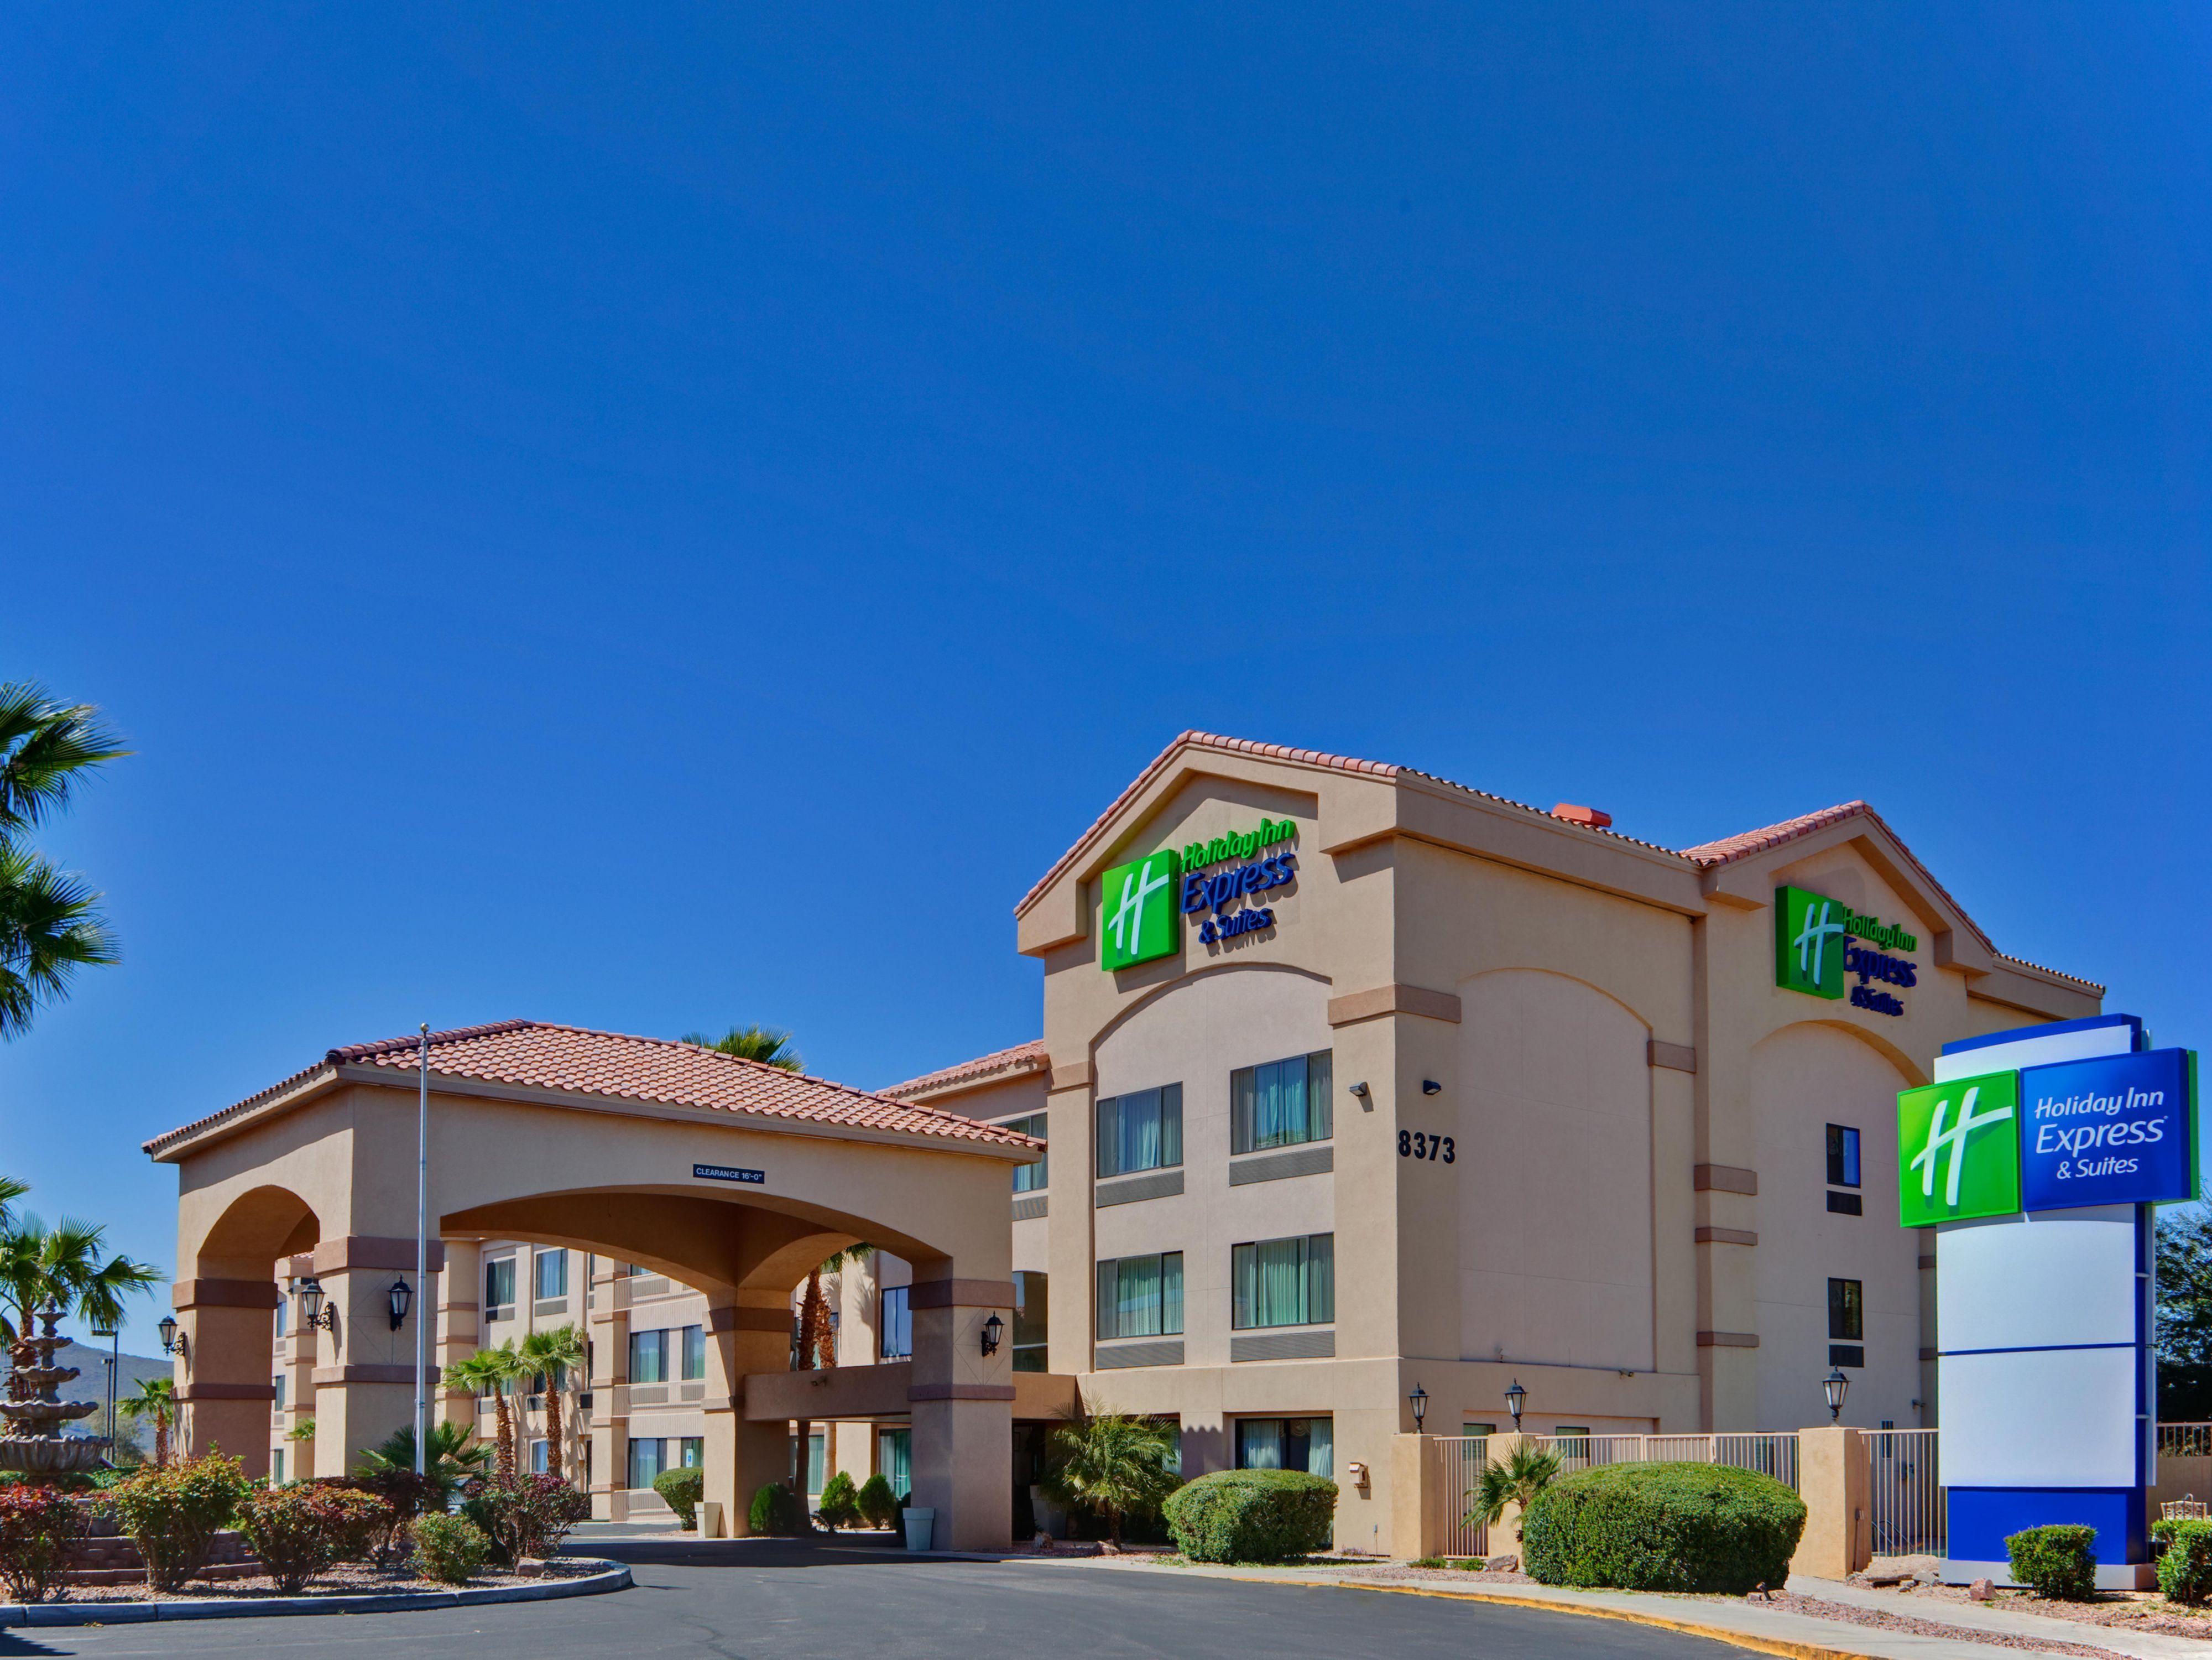 prescott comfort az en inn site official green breakfast greentree hotels valley comforter room